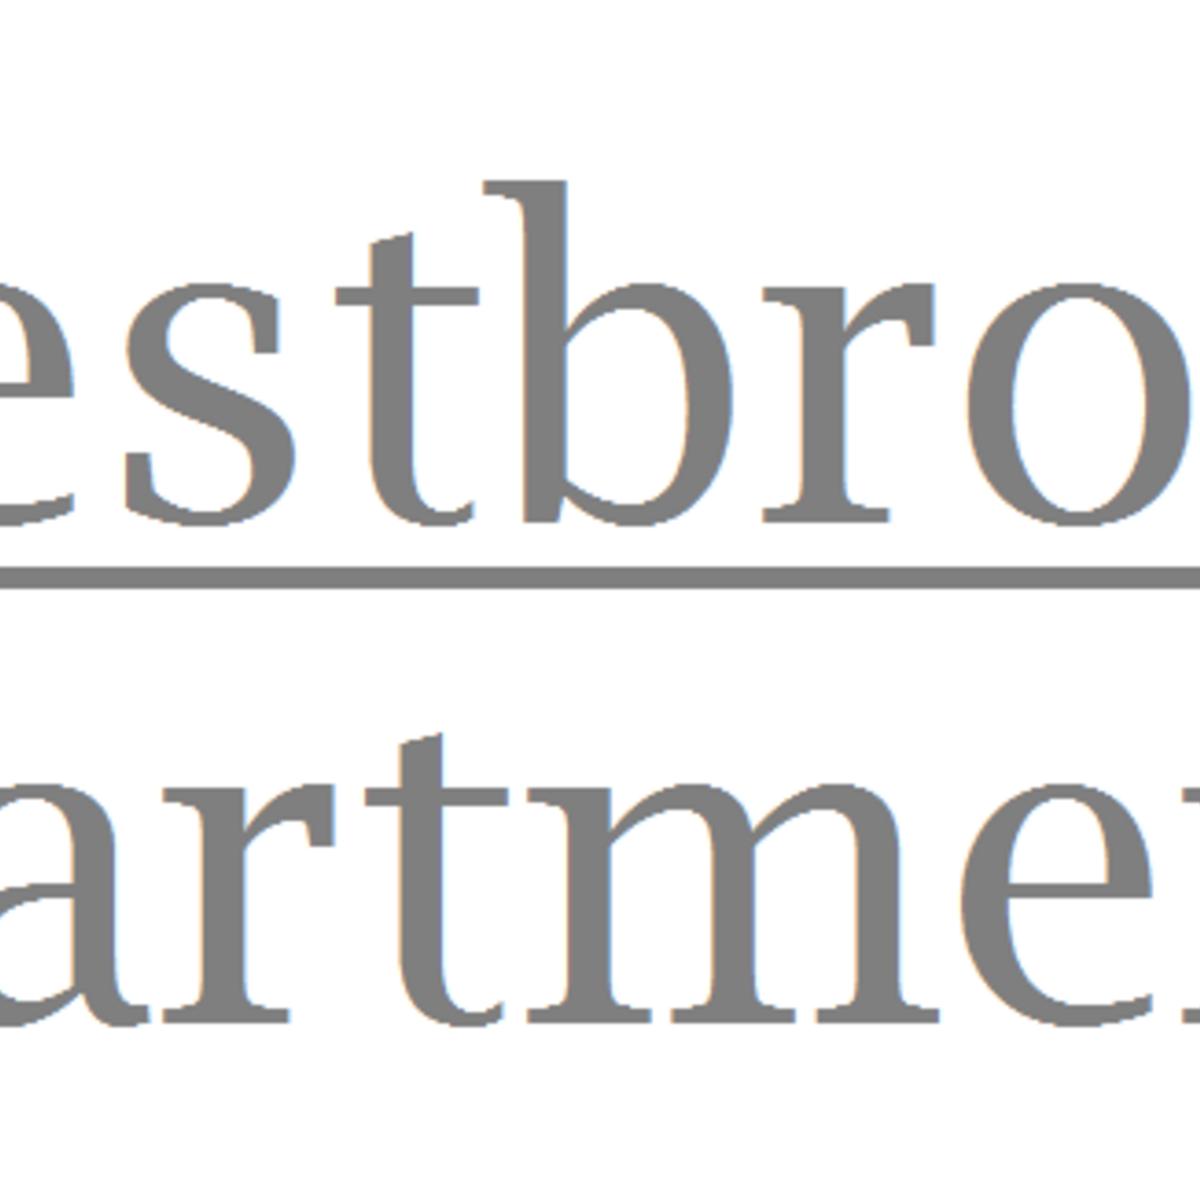 Whitmore Lake Apartments: Apartments For Rent In Whitmore Lake, MI